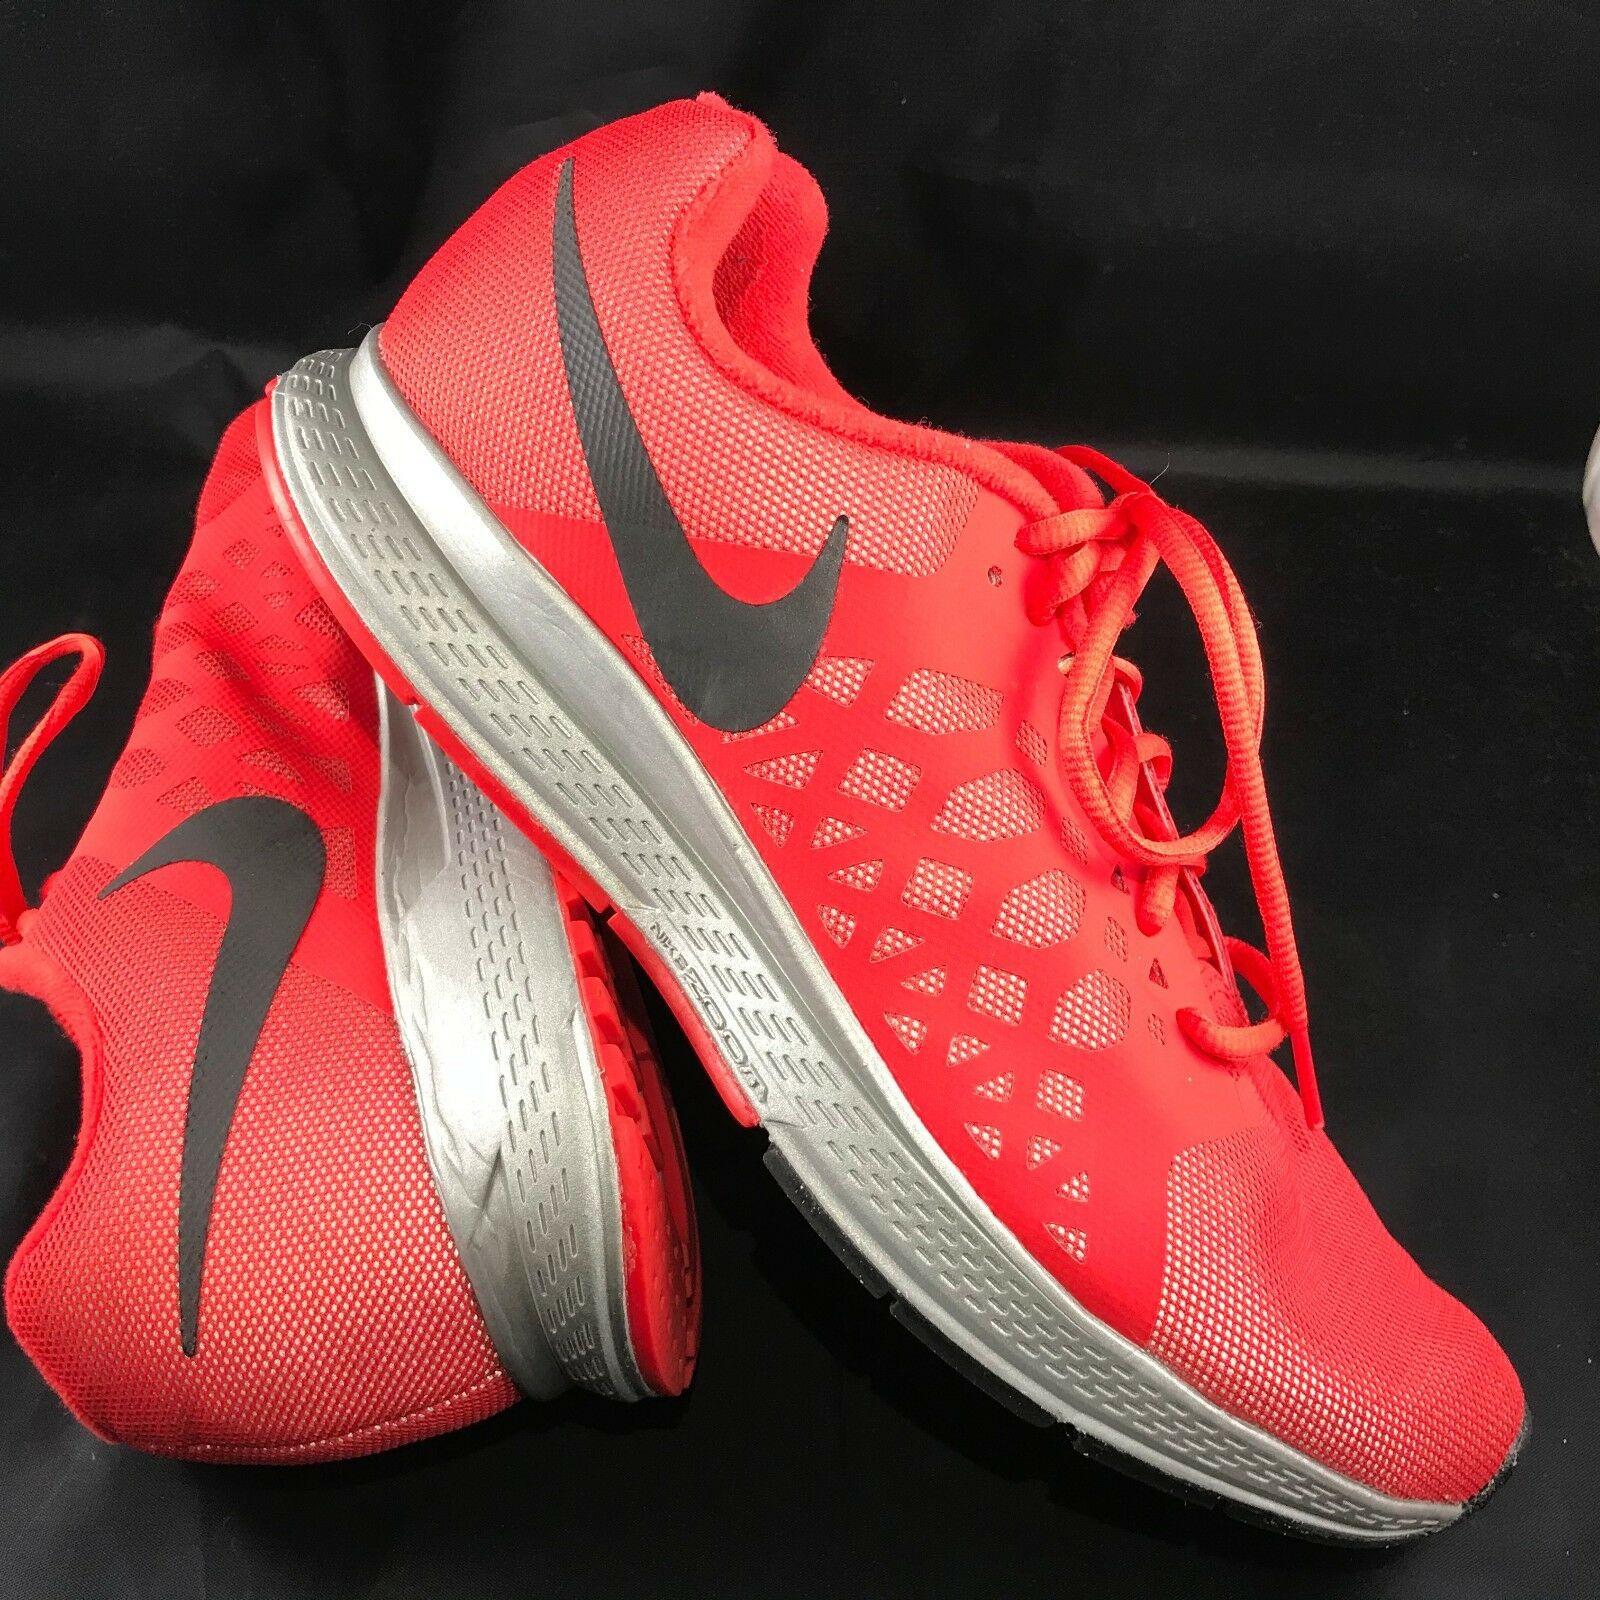 EUC NIKE ZOOM PEGASUS 31 FLASH H20 REPEL US 10 Black Blue Running Shoes Red